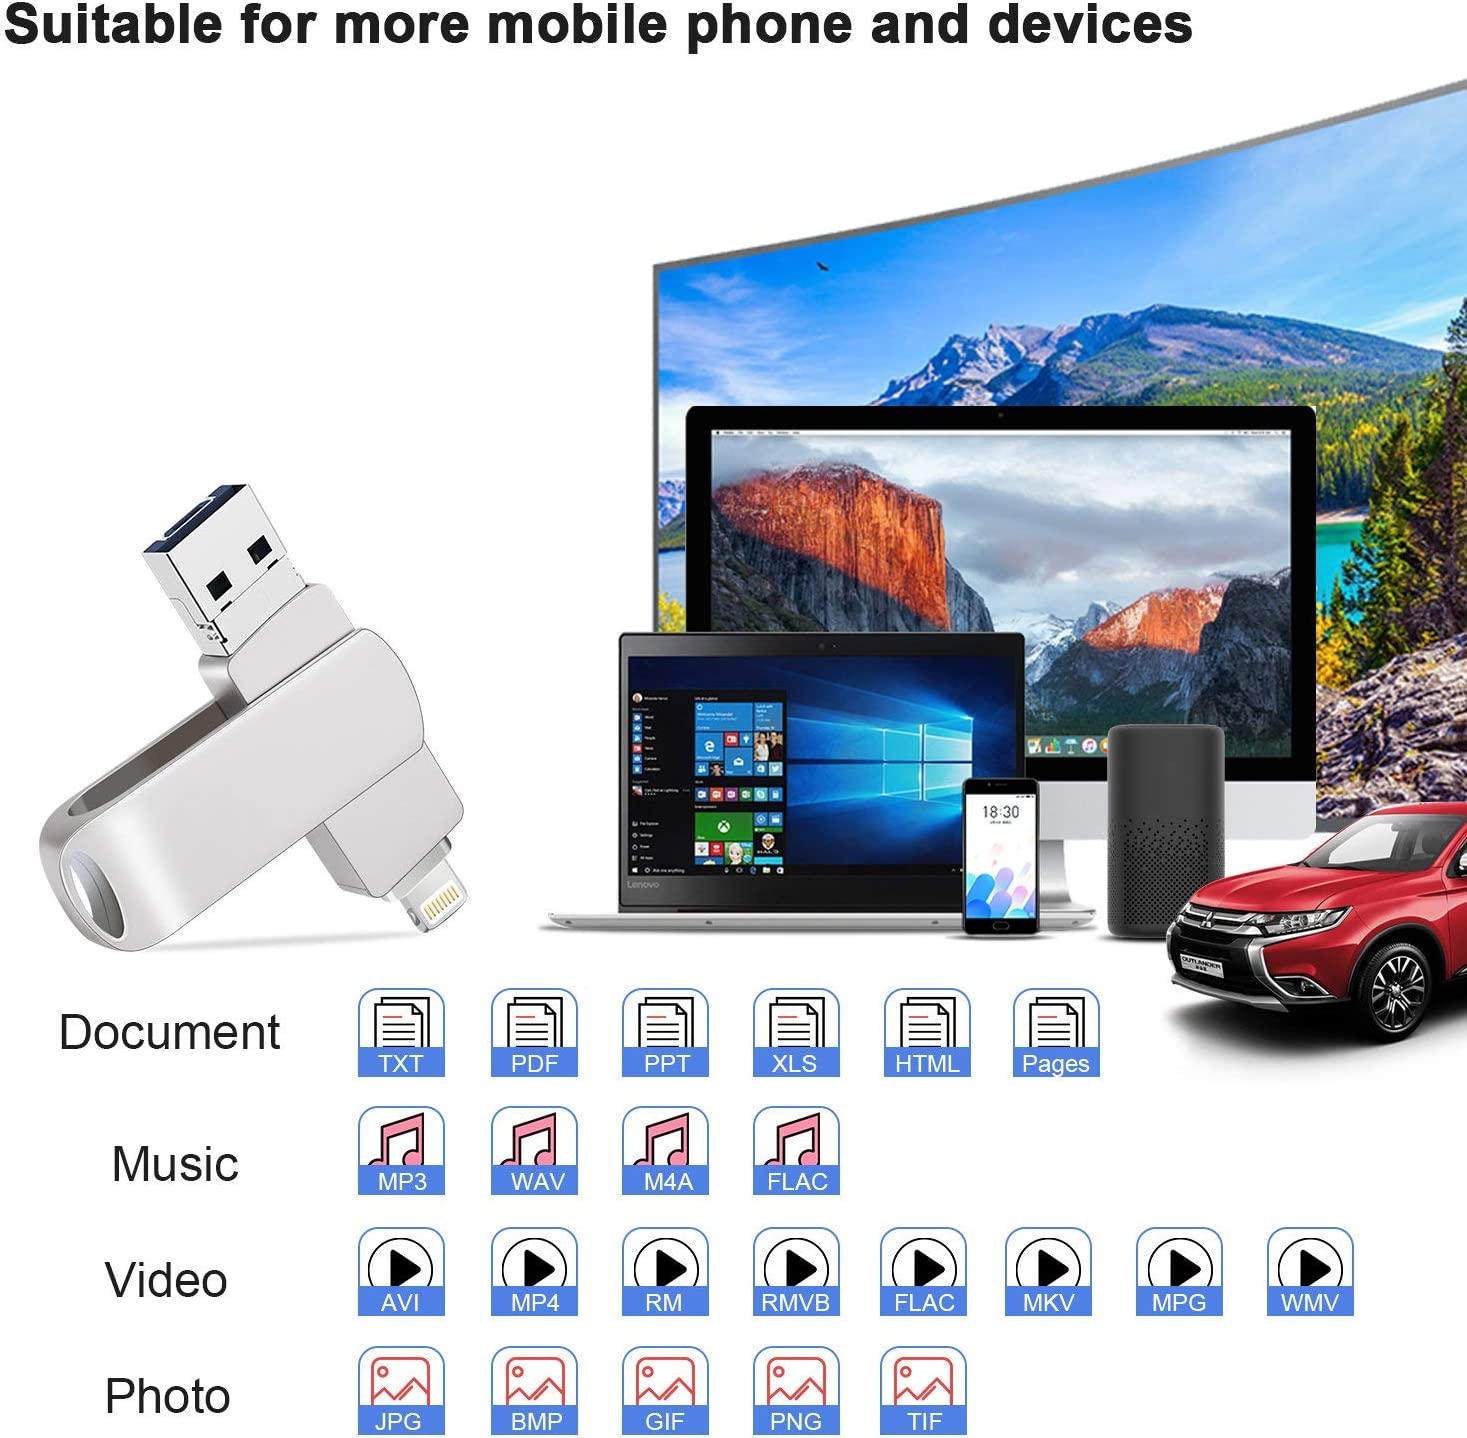 Professional Kingston 64GB for Samsung ATIV Q MicroSDXC Card Custom Verified by SanFlash. 80MBs Works with Kingston